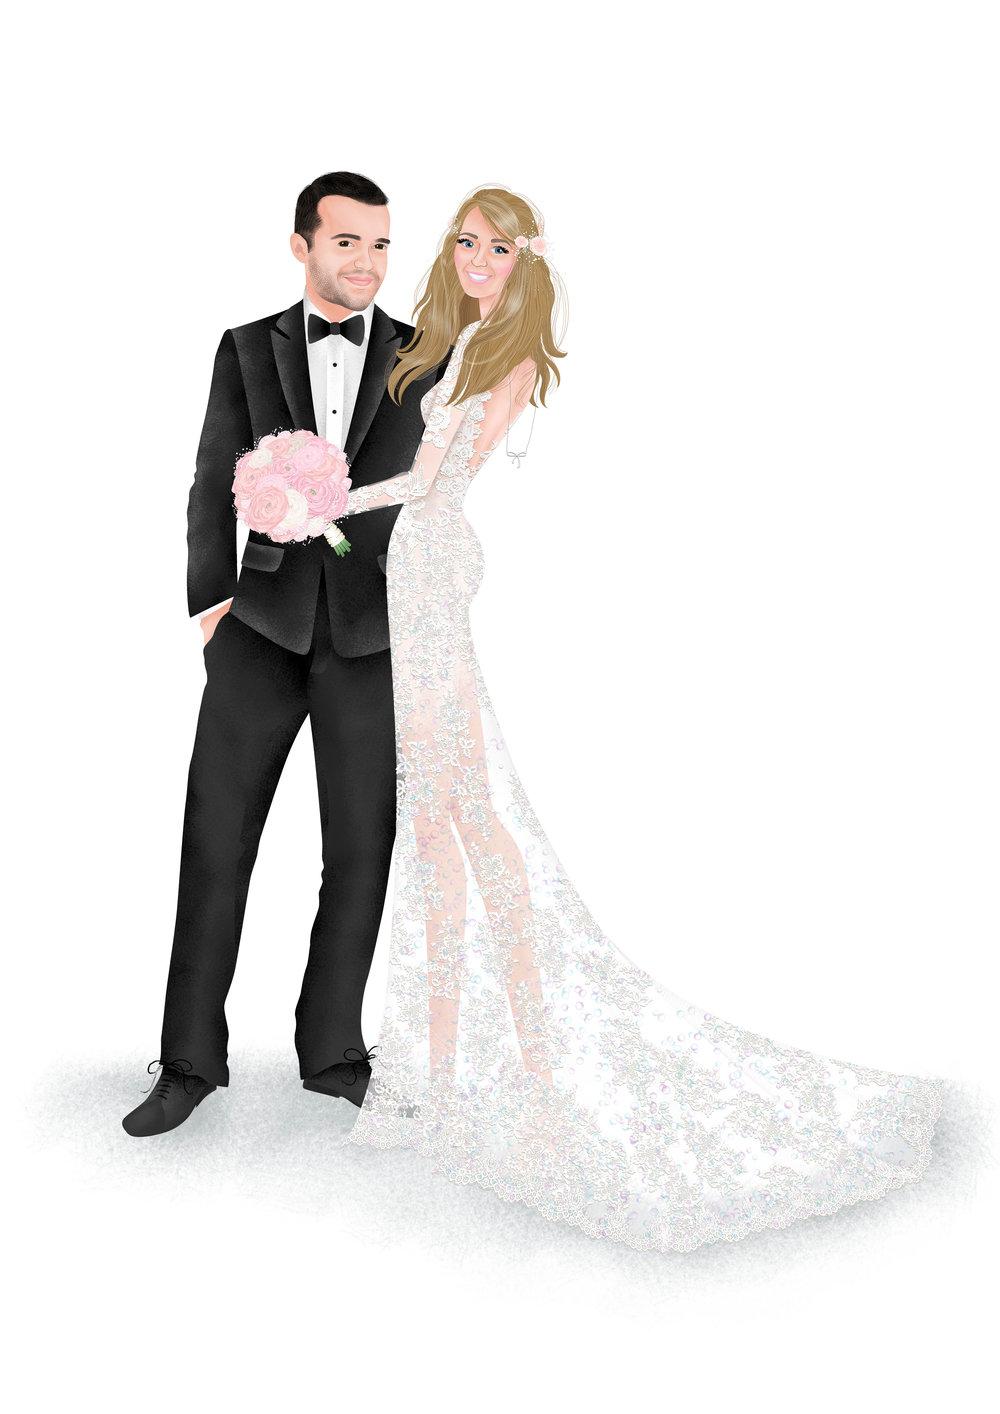 SARAH CLUNEY - BRIDE AND GROOM evening - A2.jpg